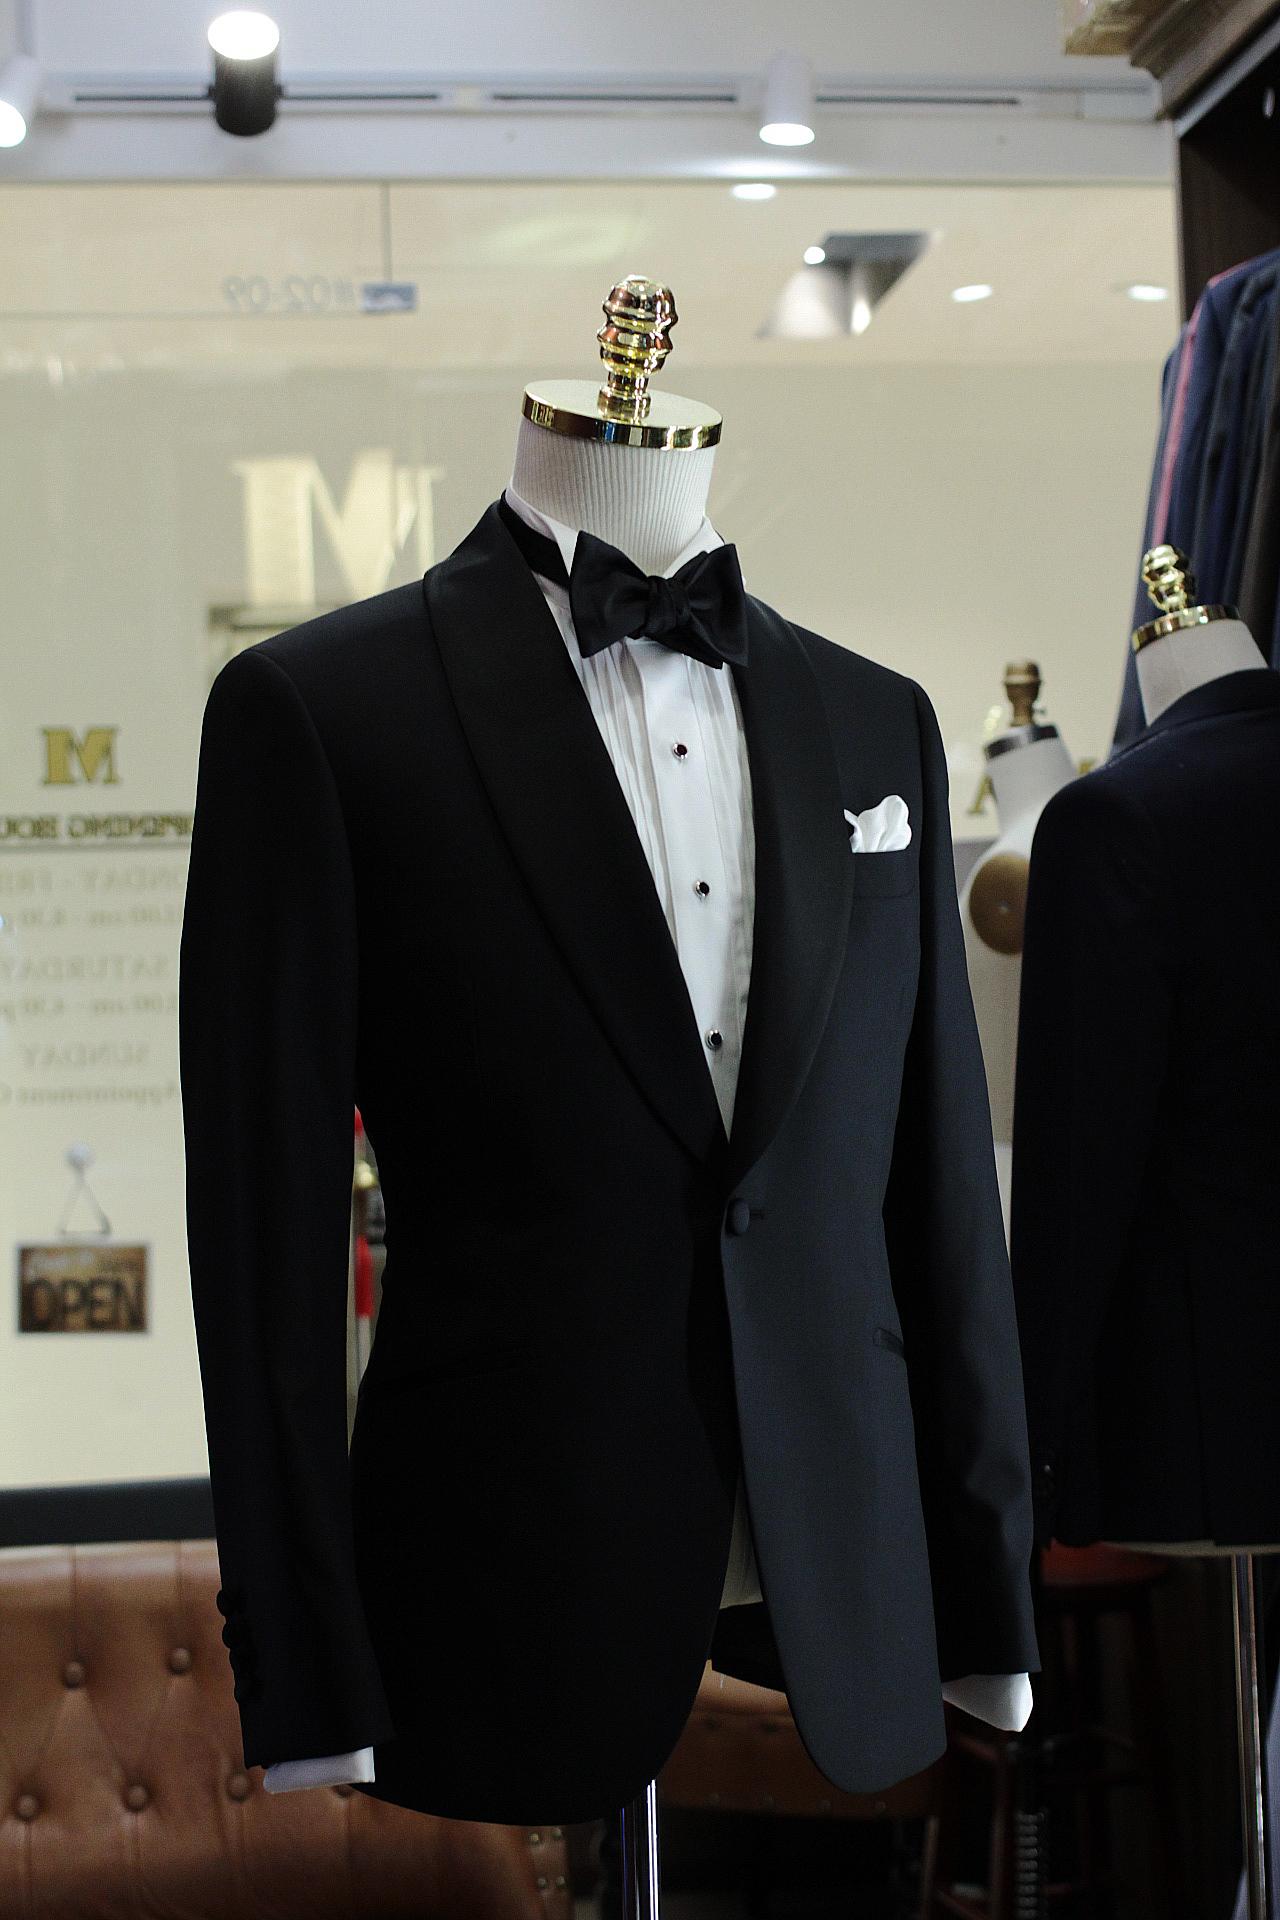 Skyfall Tuxedo Made Suits Tailored Bespoke Tuxedo Singapore.JPG